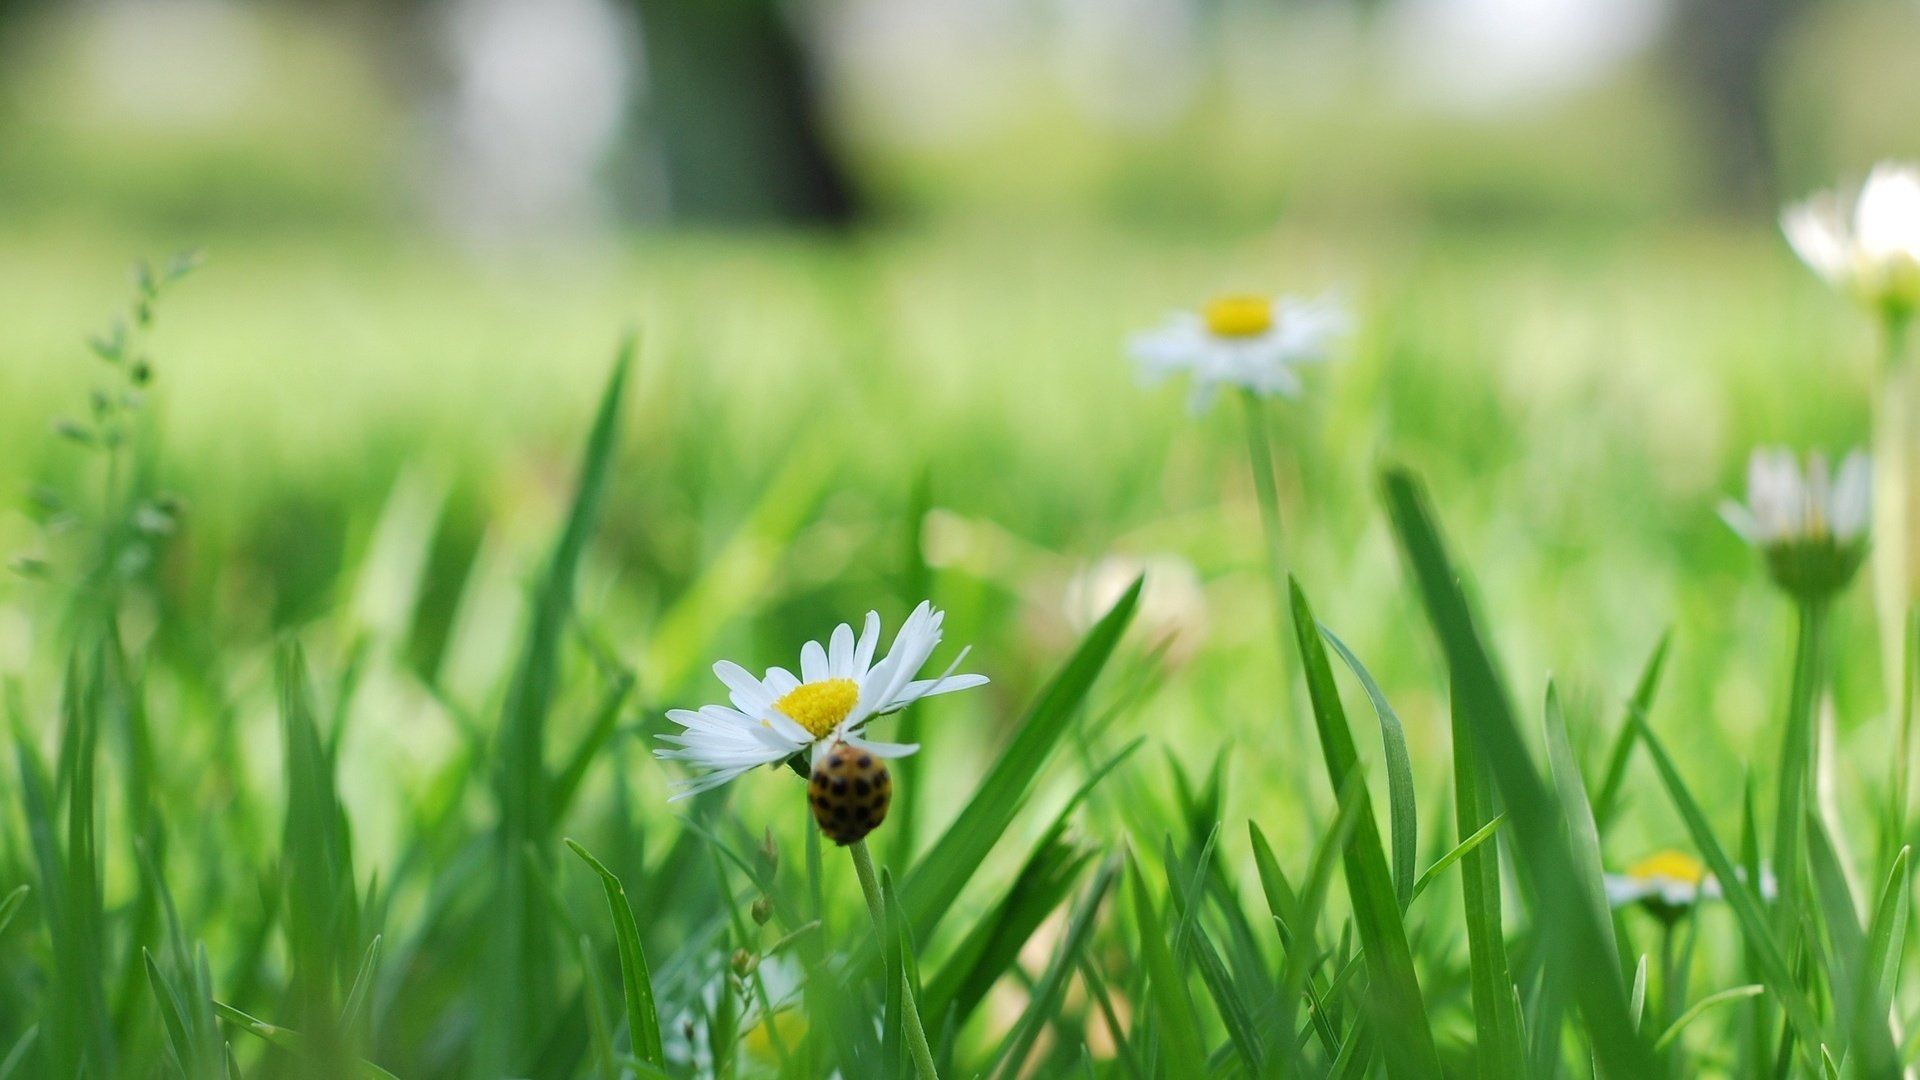 ромашки трава chamomile grass  № 3837805 загрузить